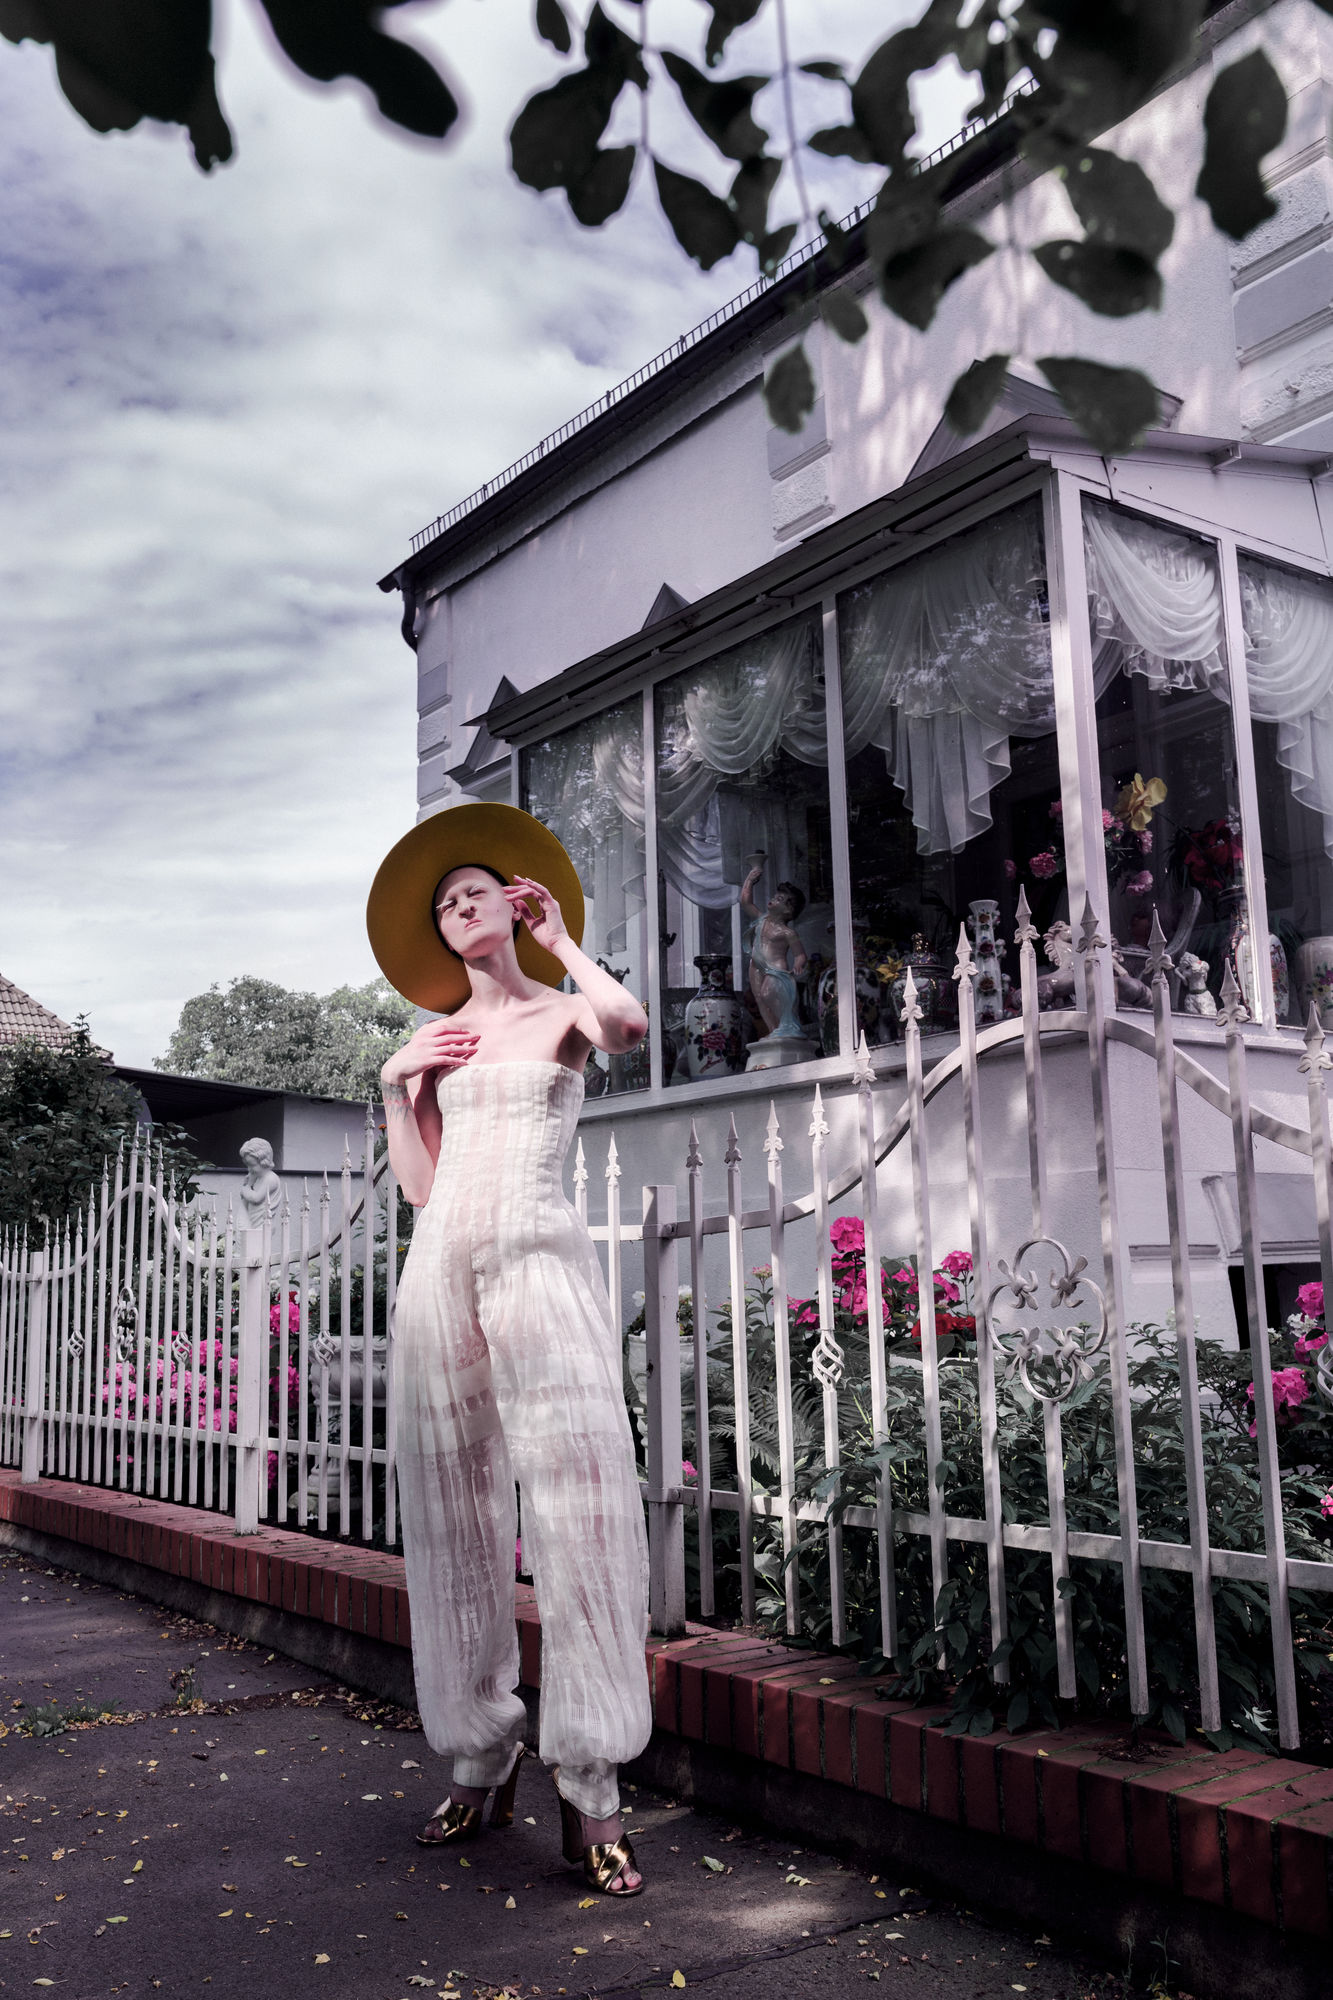 Melanie Gaydos - The Girl Next Door #5